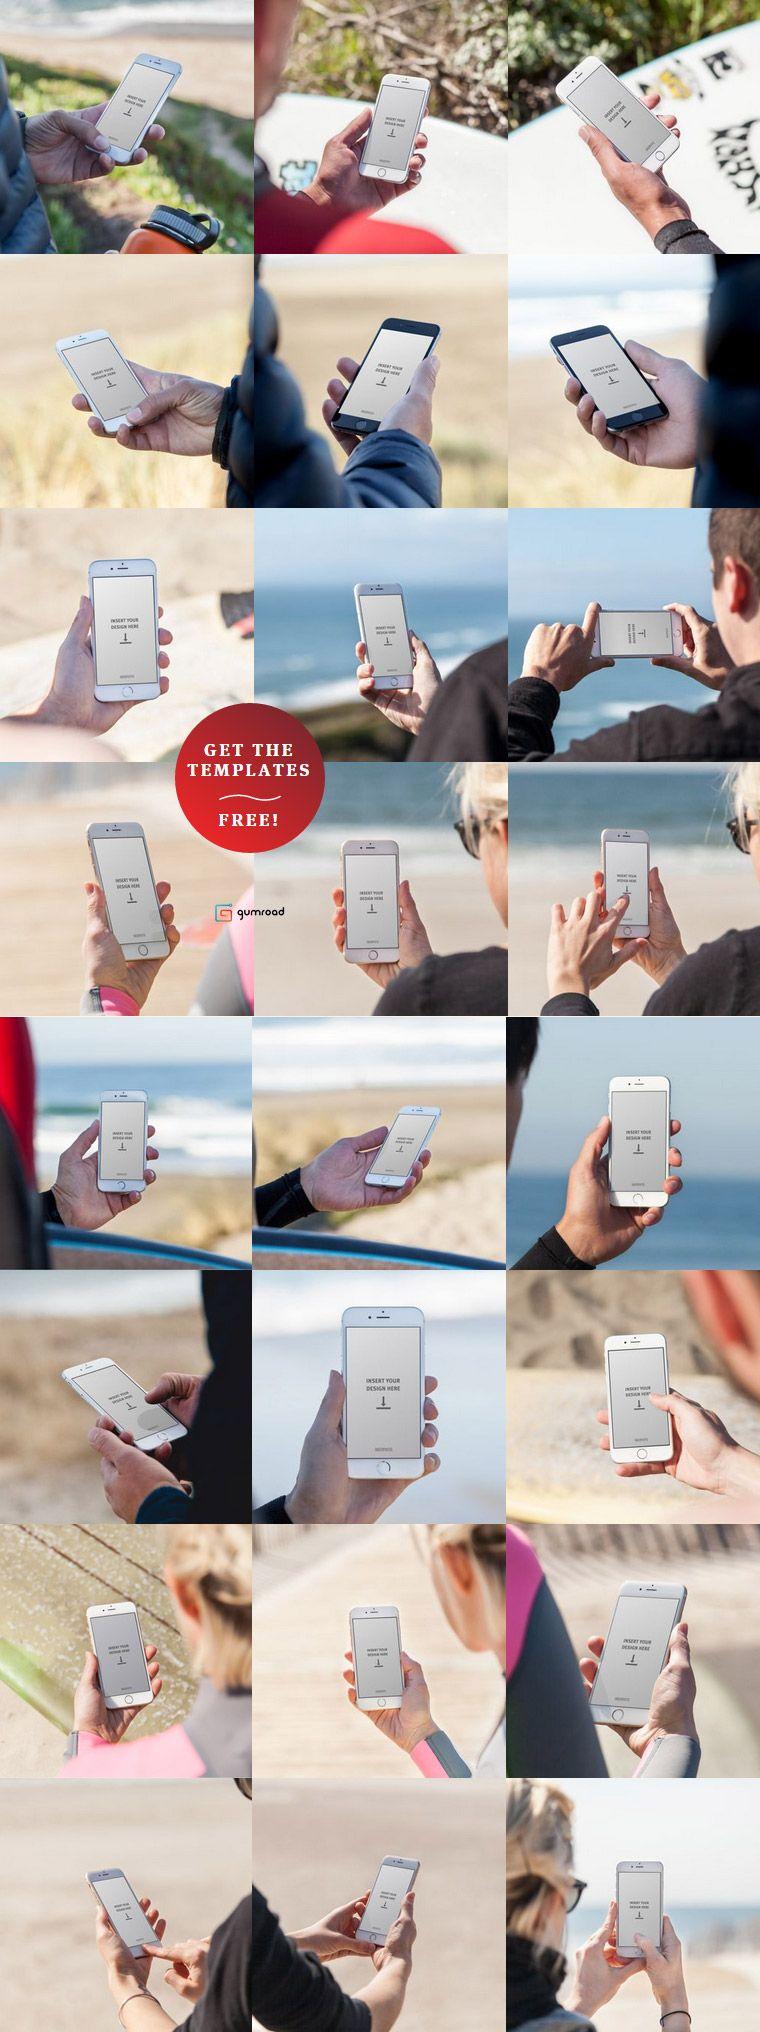 Iphone mockup tools